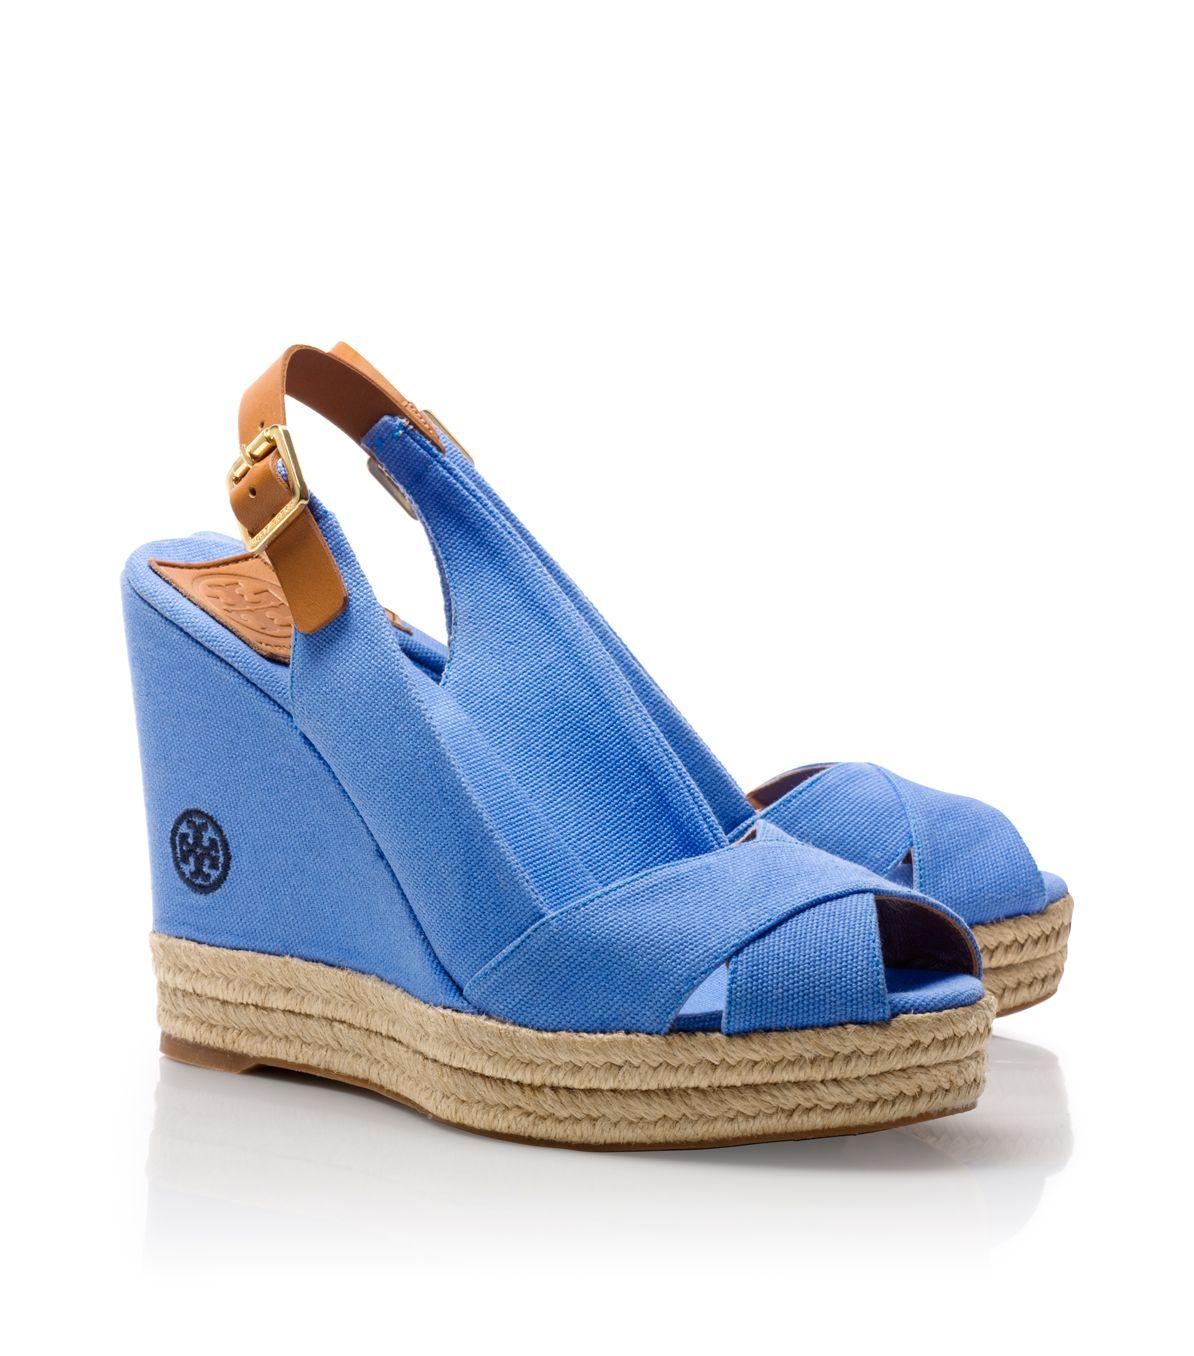 5d0fe43f1da0 Lyst - Tory Burch Beller Wedge in Blue